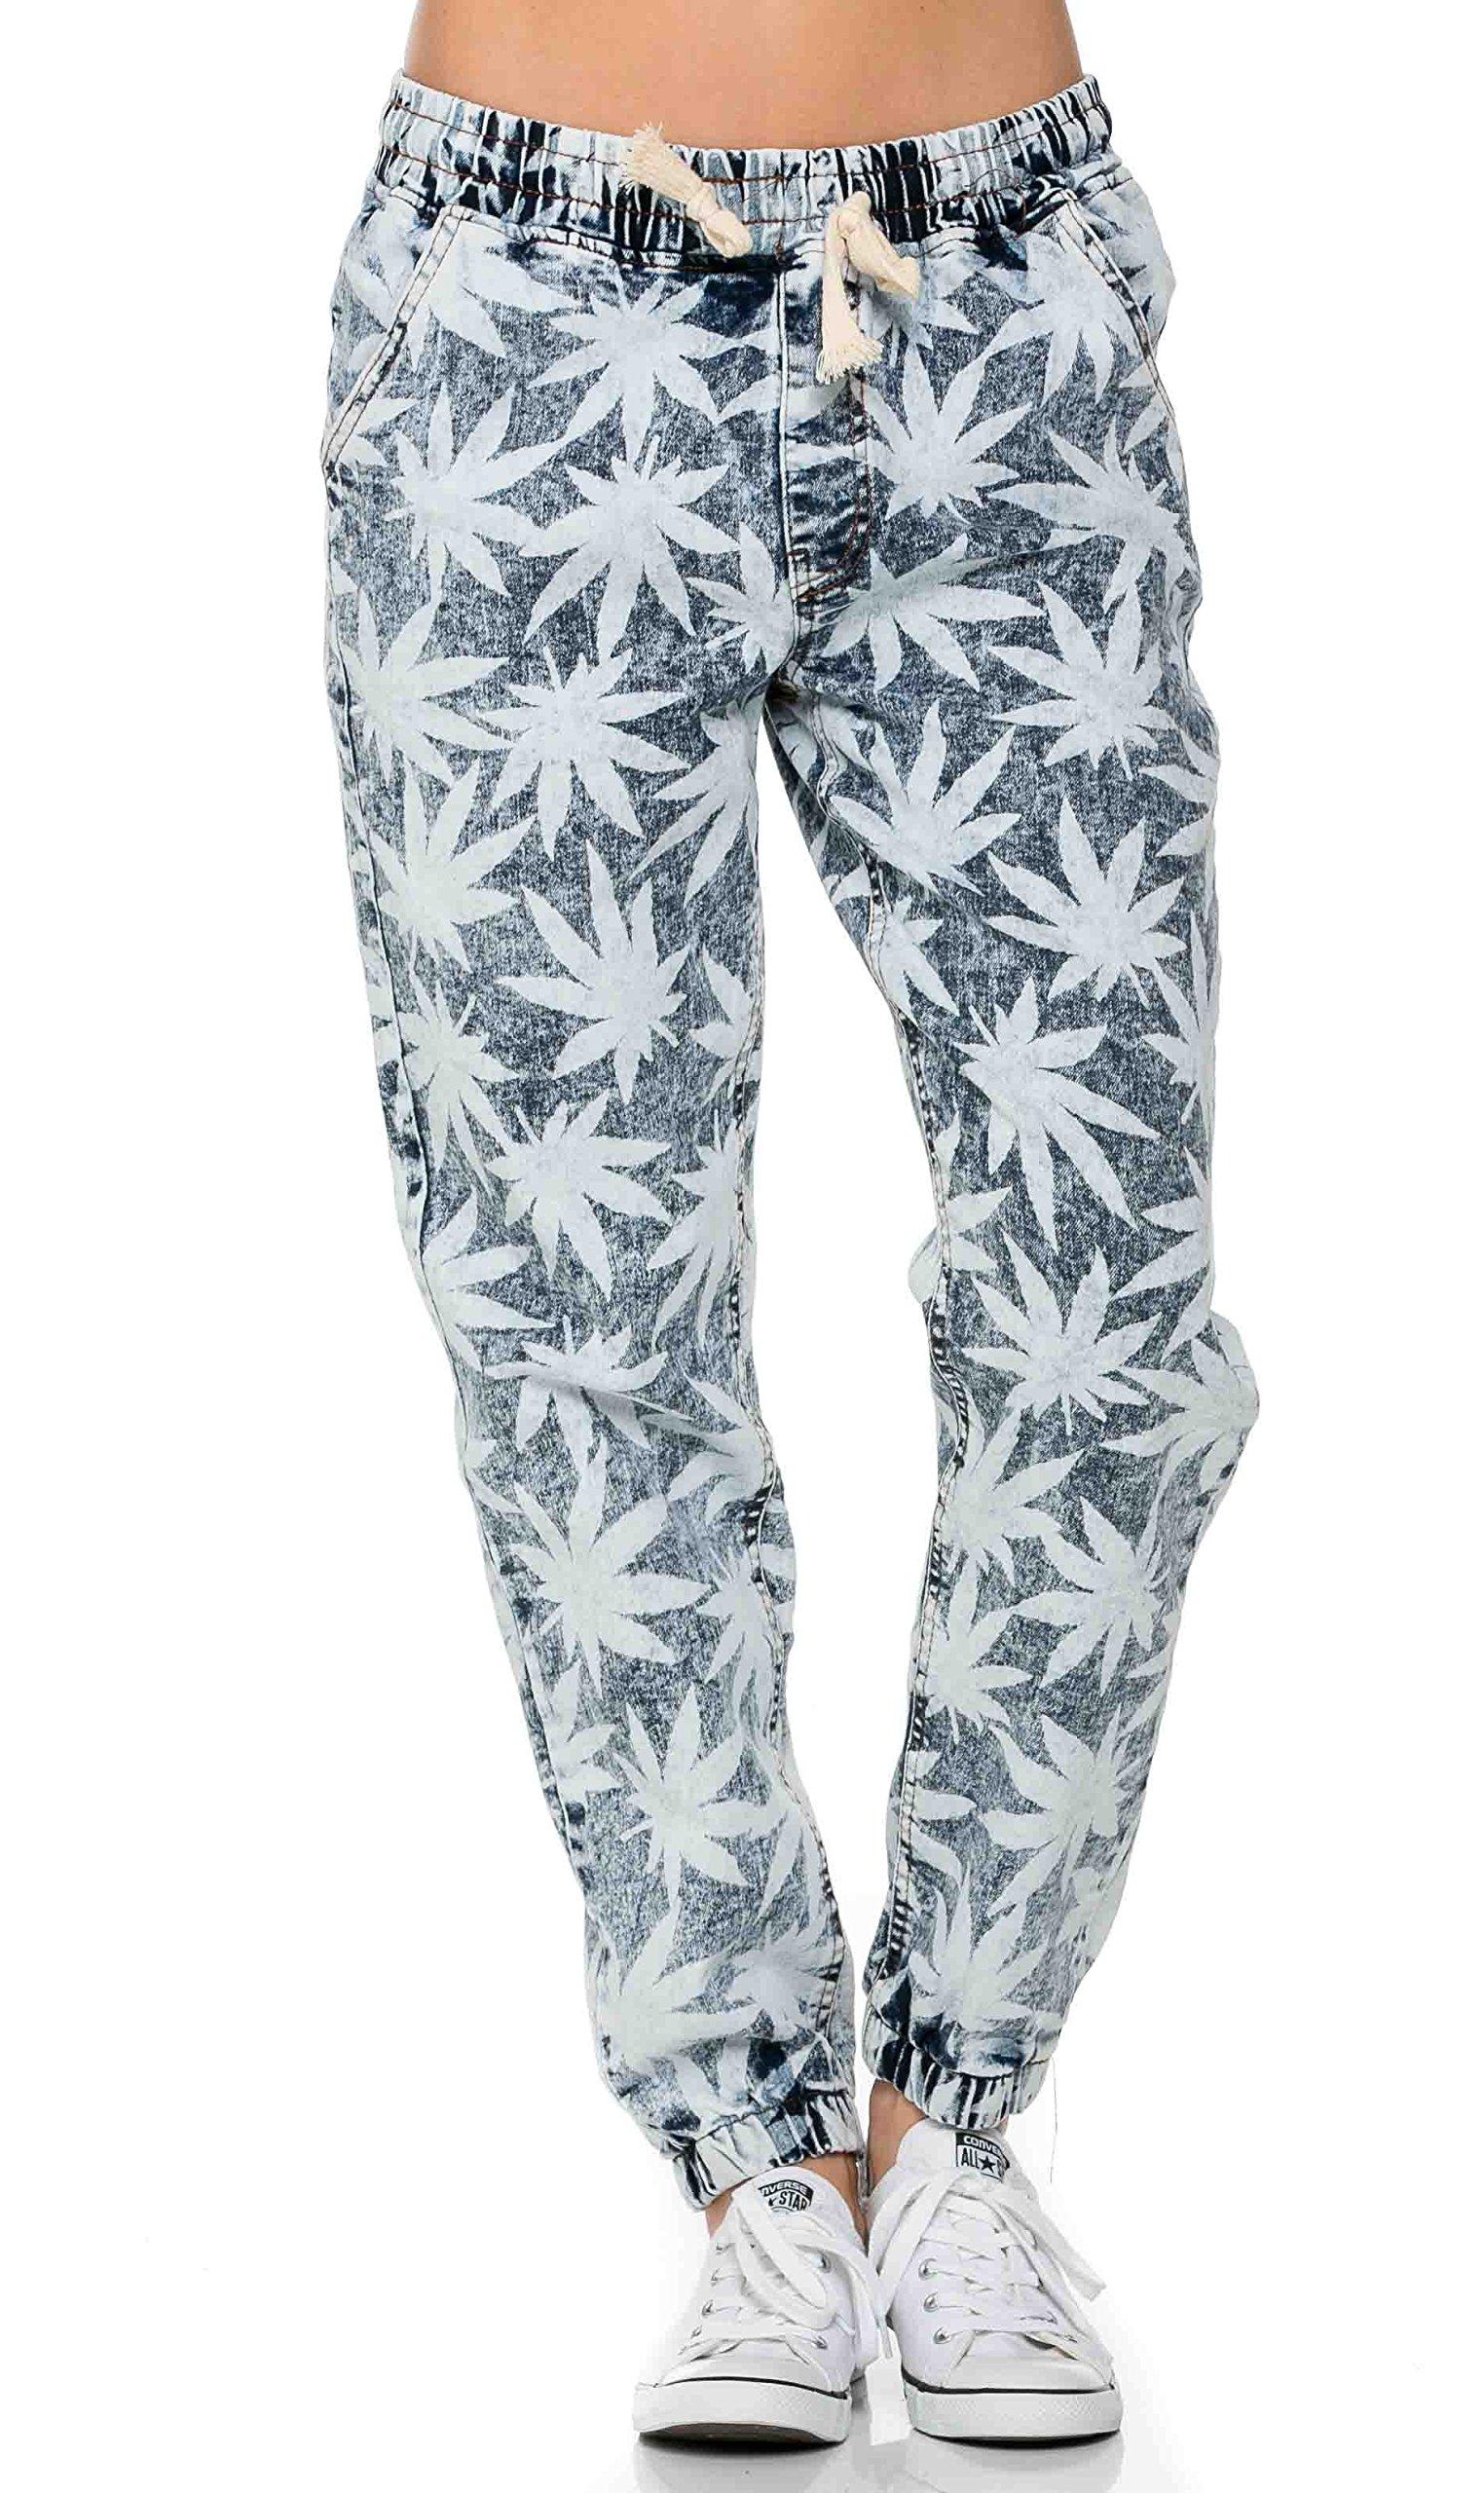 Weed Print Denim Jogger Pants Marijuana